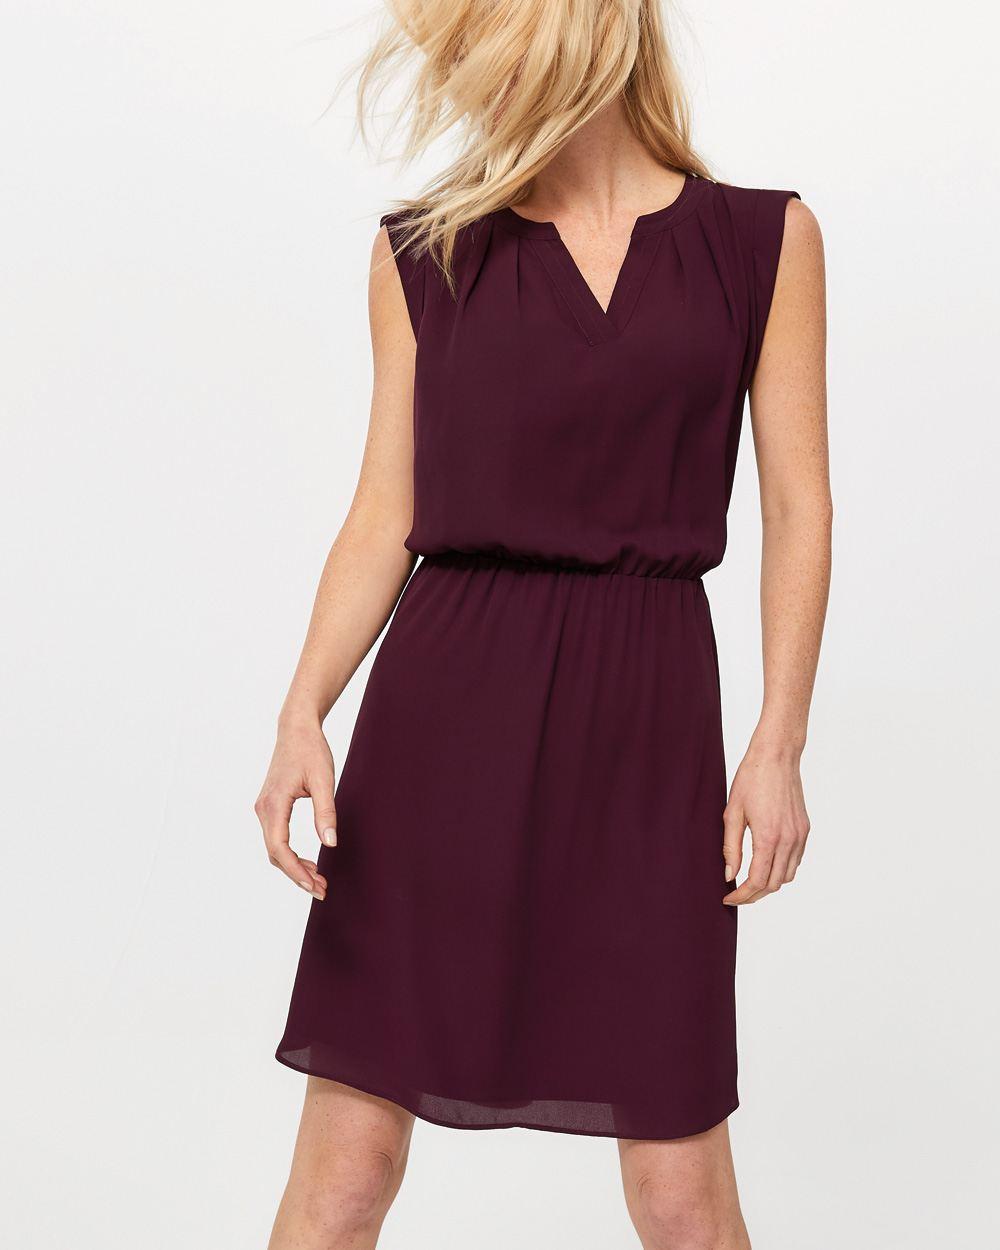 970cfd870f1 Sleeveless Elastic Waist Solid Dress